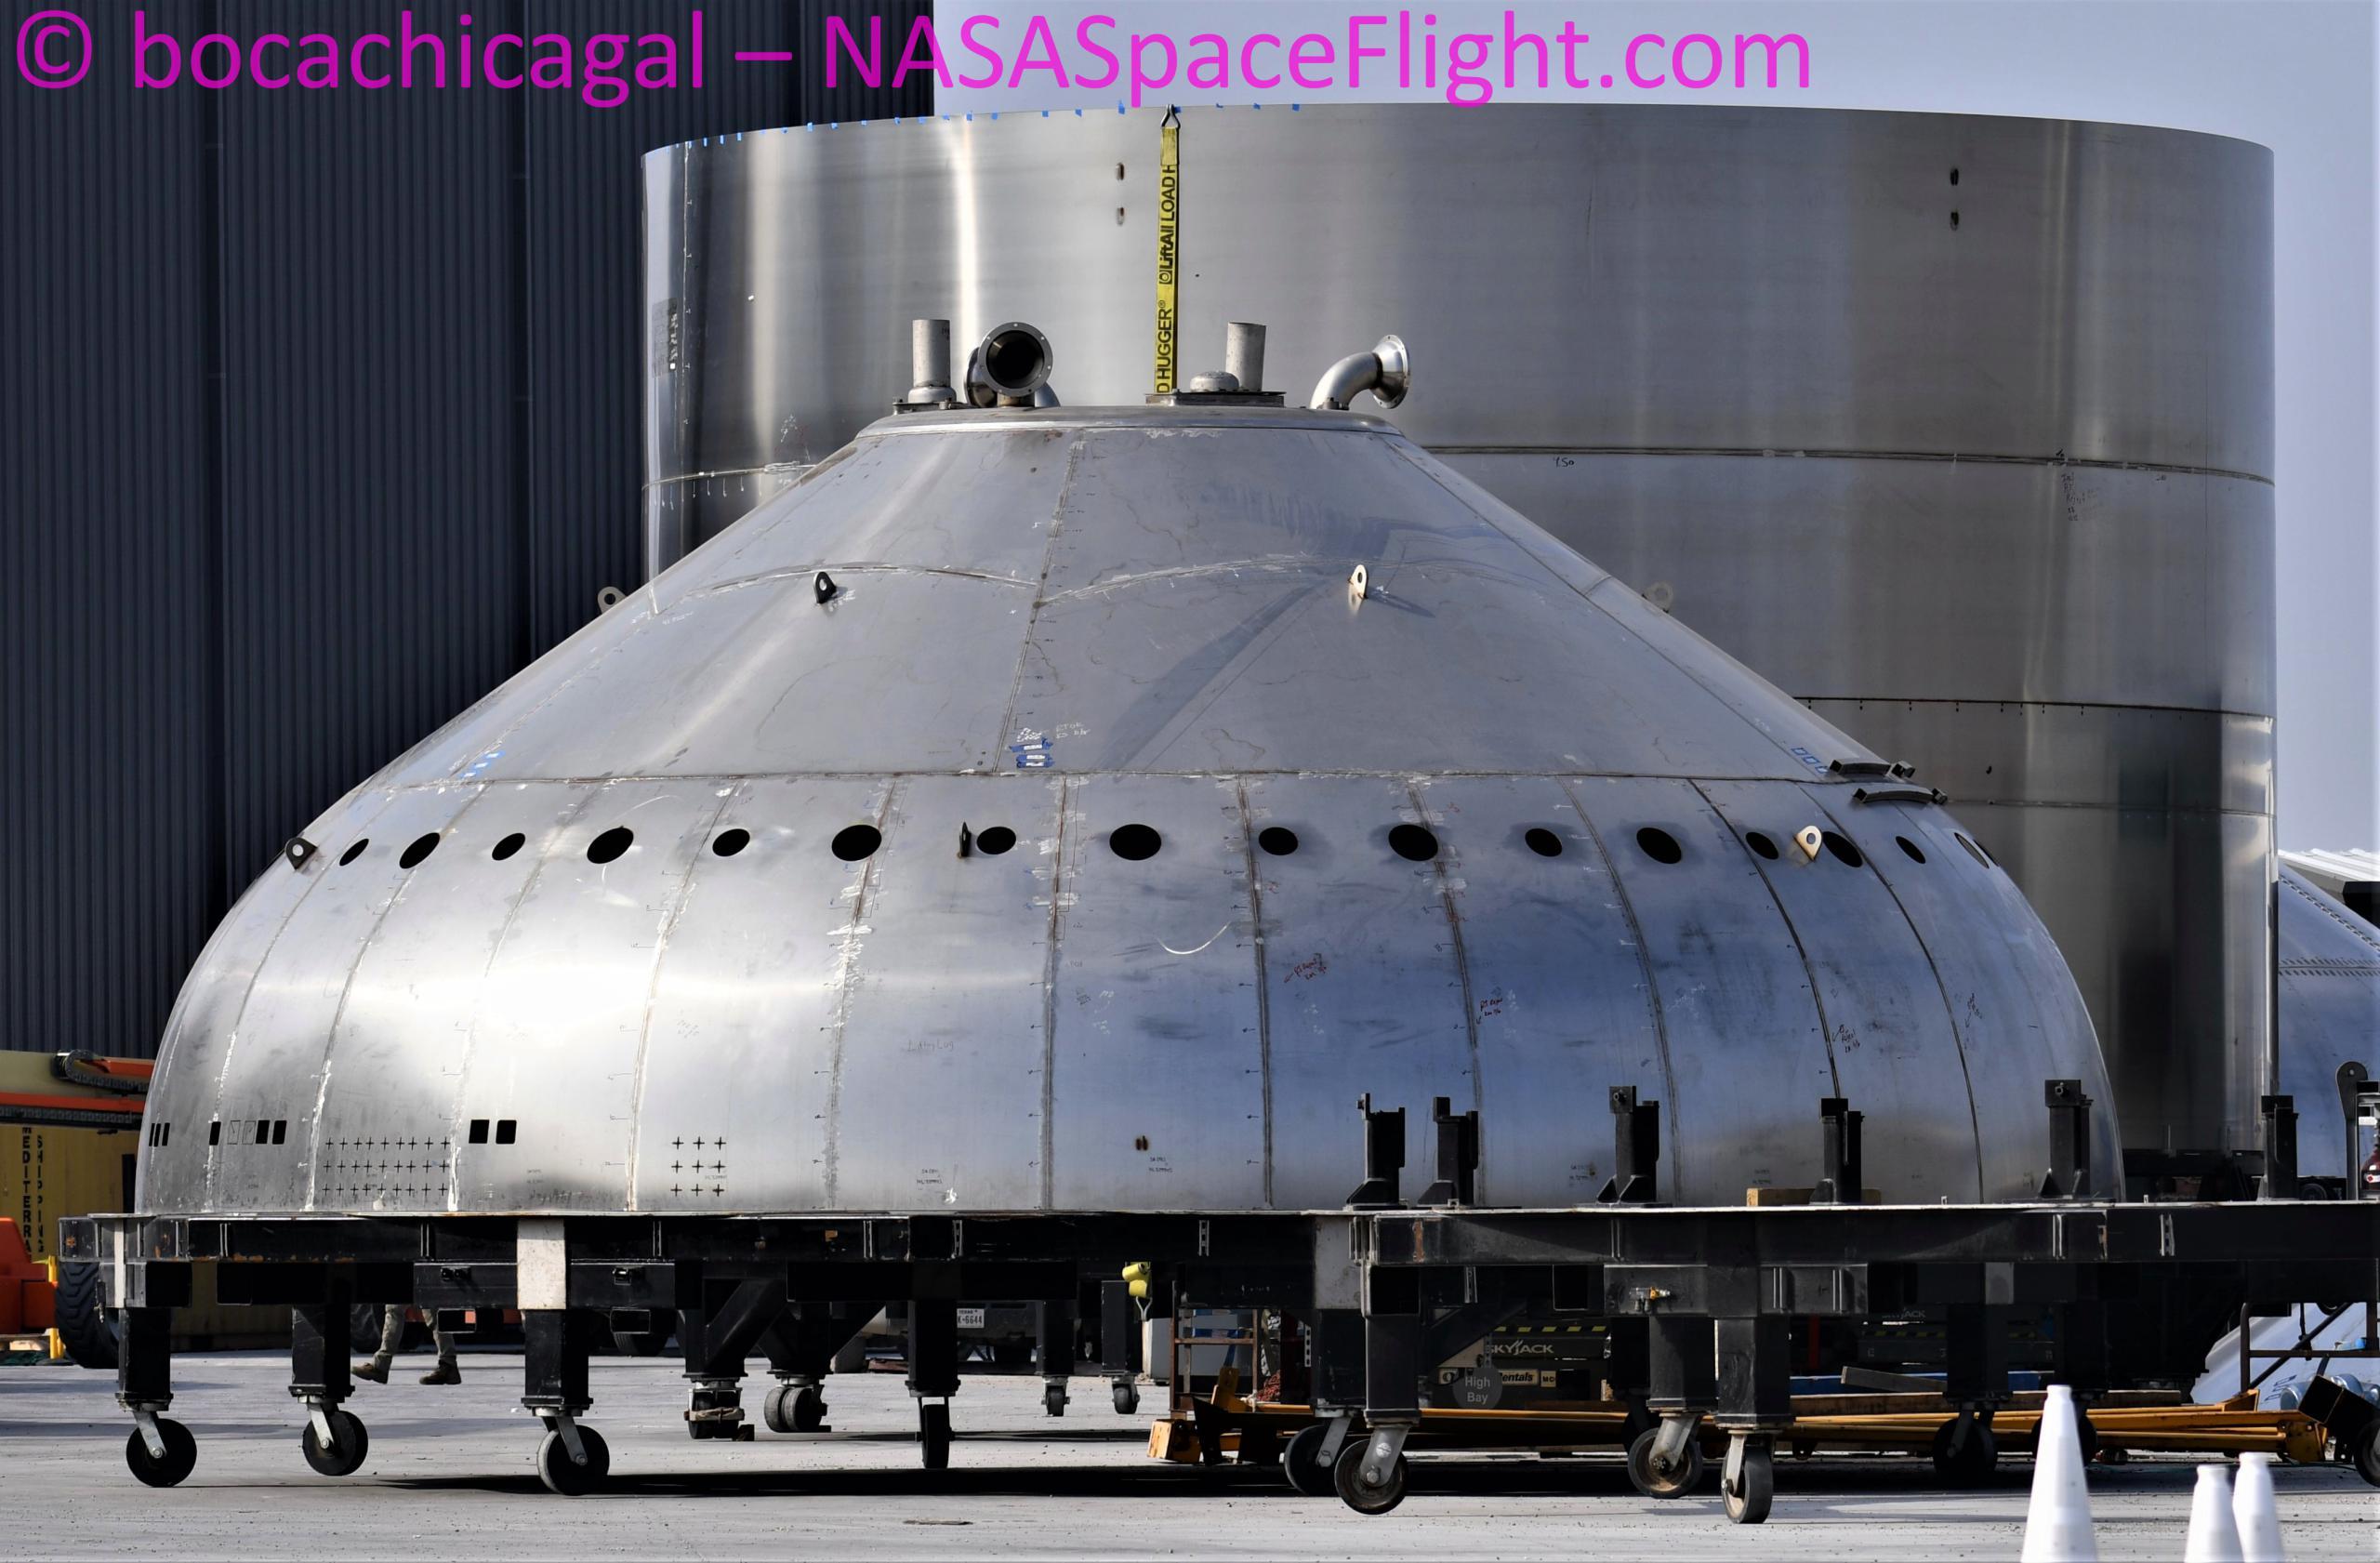 Starship Boca Chica 012521 (NASASpaceflight – bocachicagal) Super Heavy thrust dome practice 1 (c)